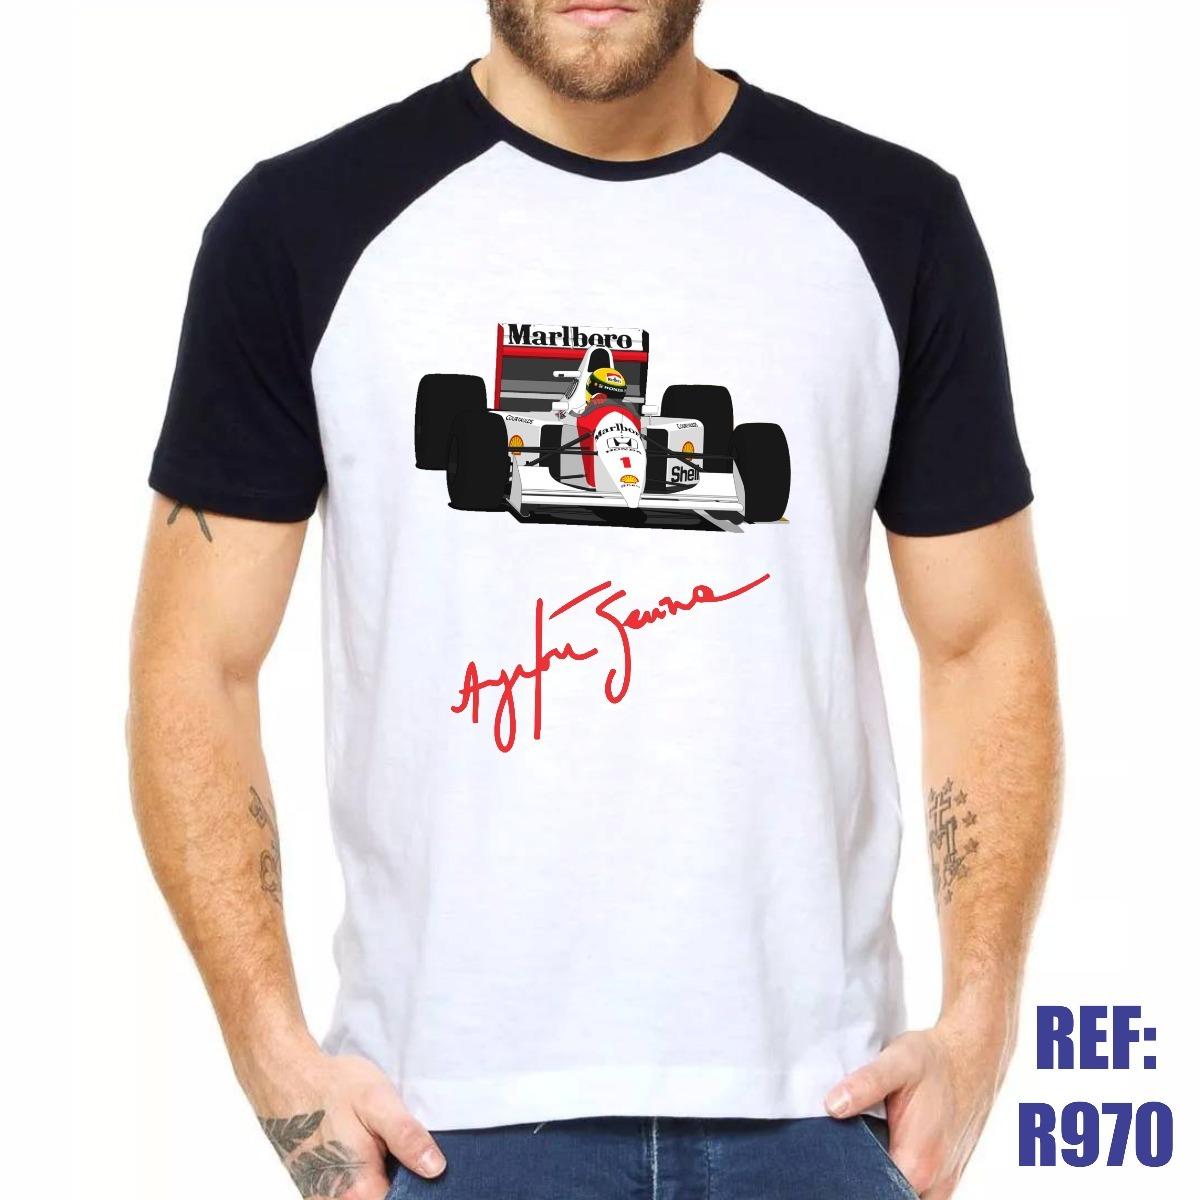 03641a2feb camisa raglan piloto corrida equipe carro automobilismo auto. Carregando  zoom.